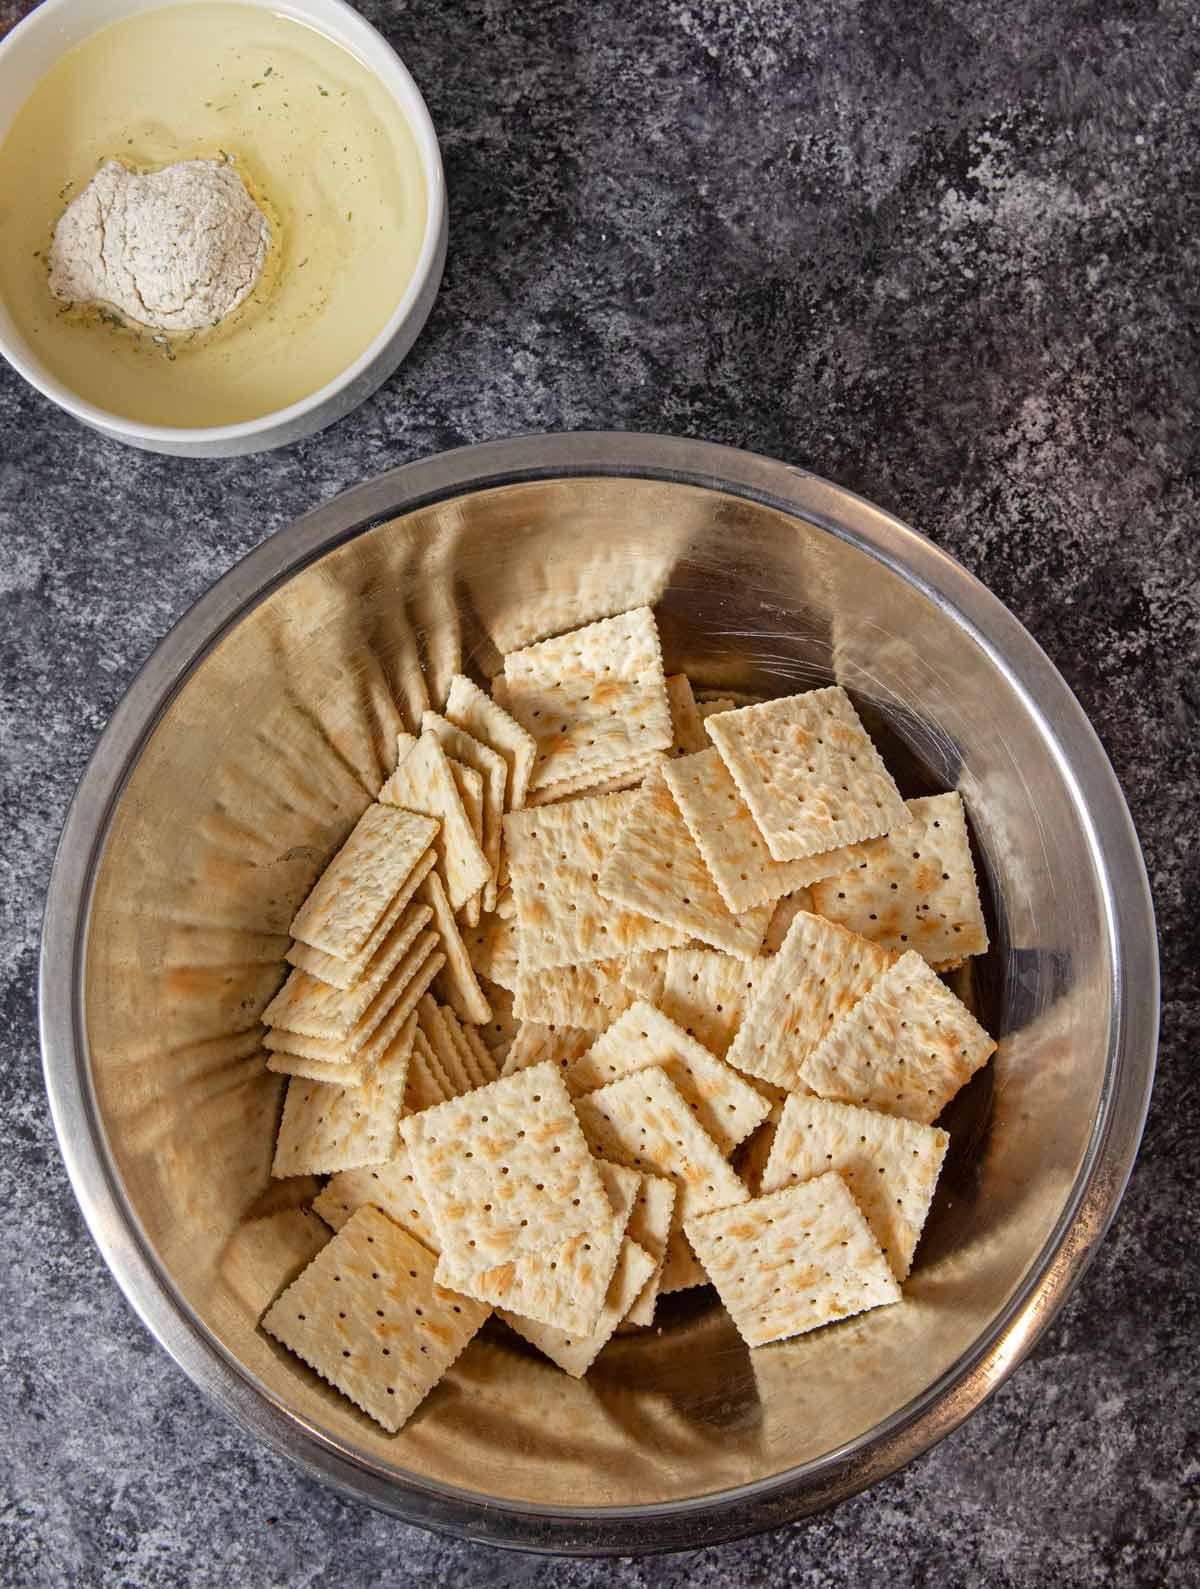 Ranch Mix Saltines ingredients in bowls